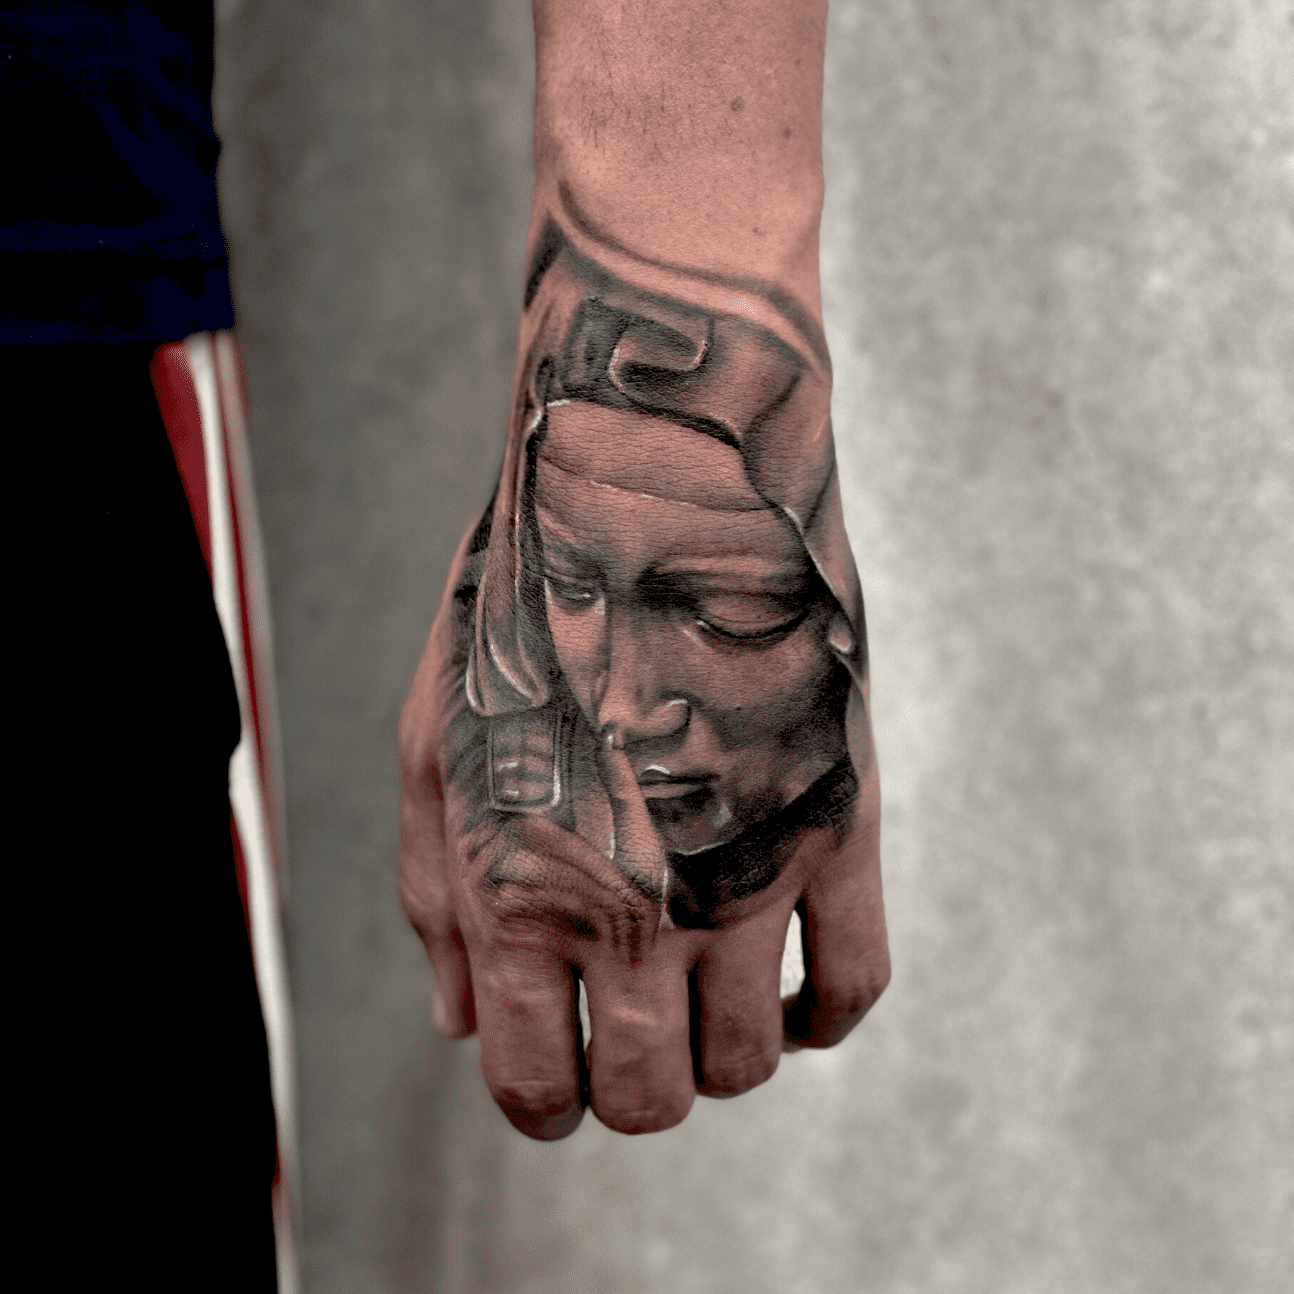 Tatuarsi-d'estate-Maria-Mano-Tatooo-alt